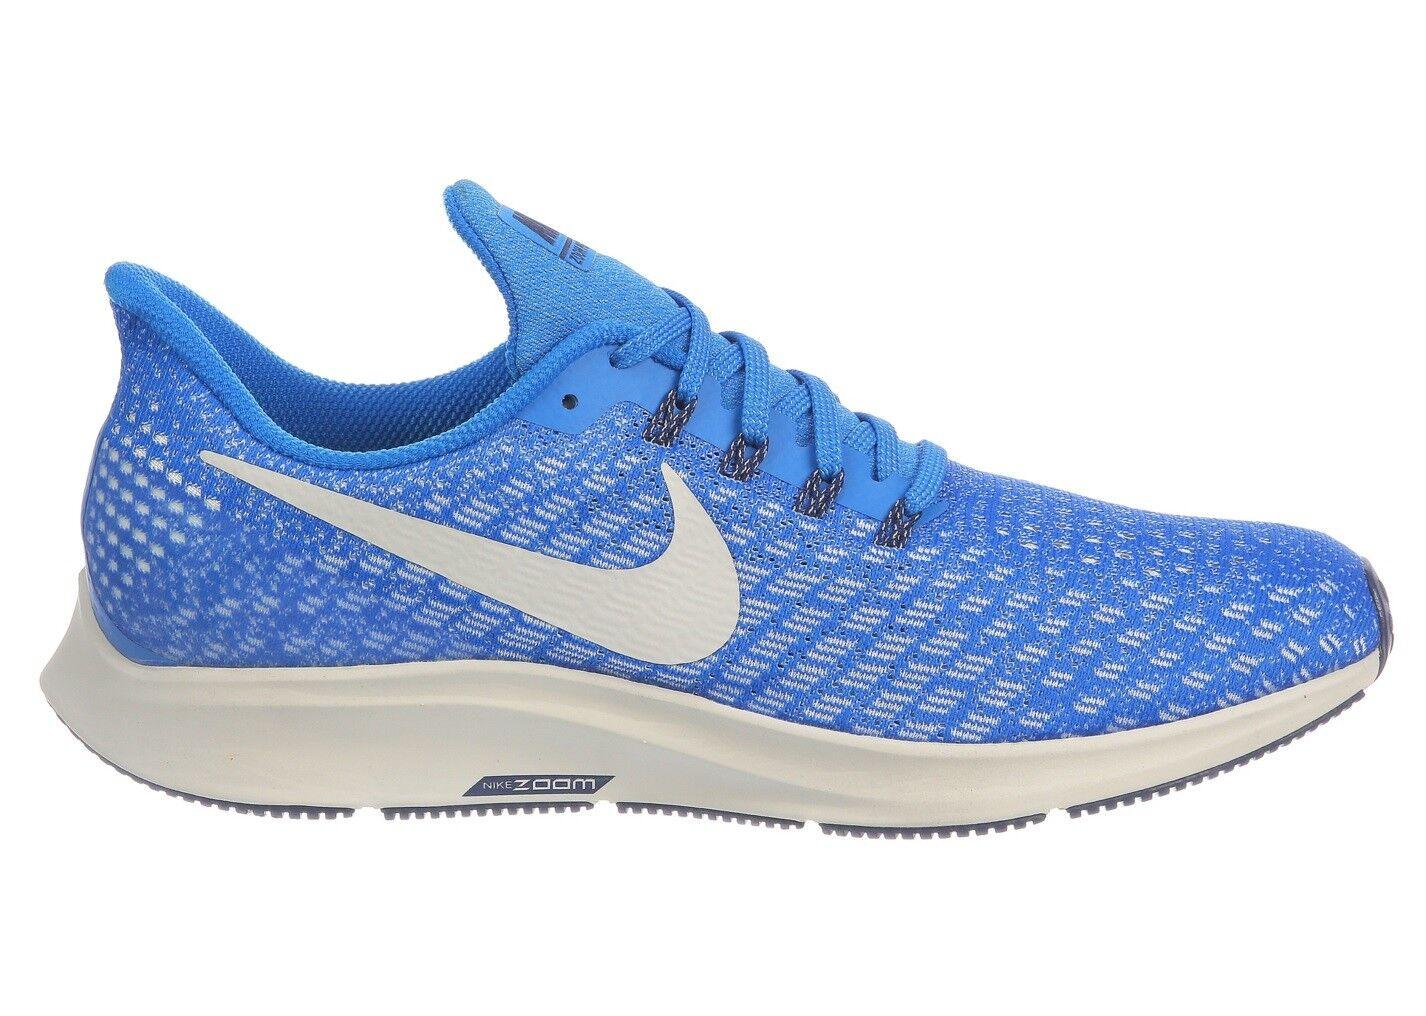 Nike scarpe air zoom pegasus 35 uomini 942851-402 cobalto blaze scarpe Nike da corsa numero 13 dc4176